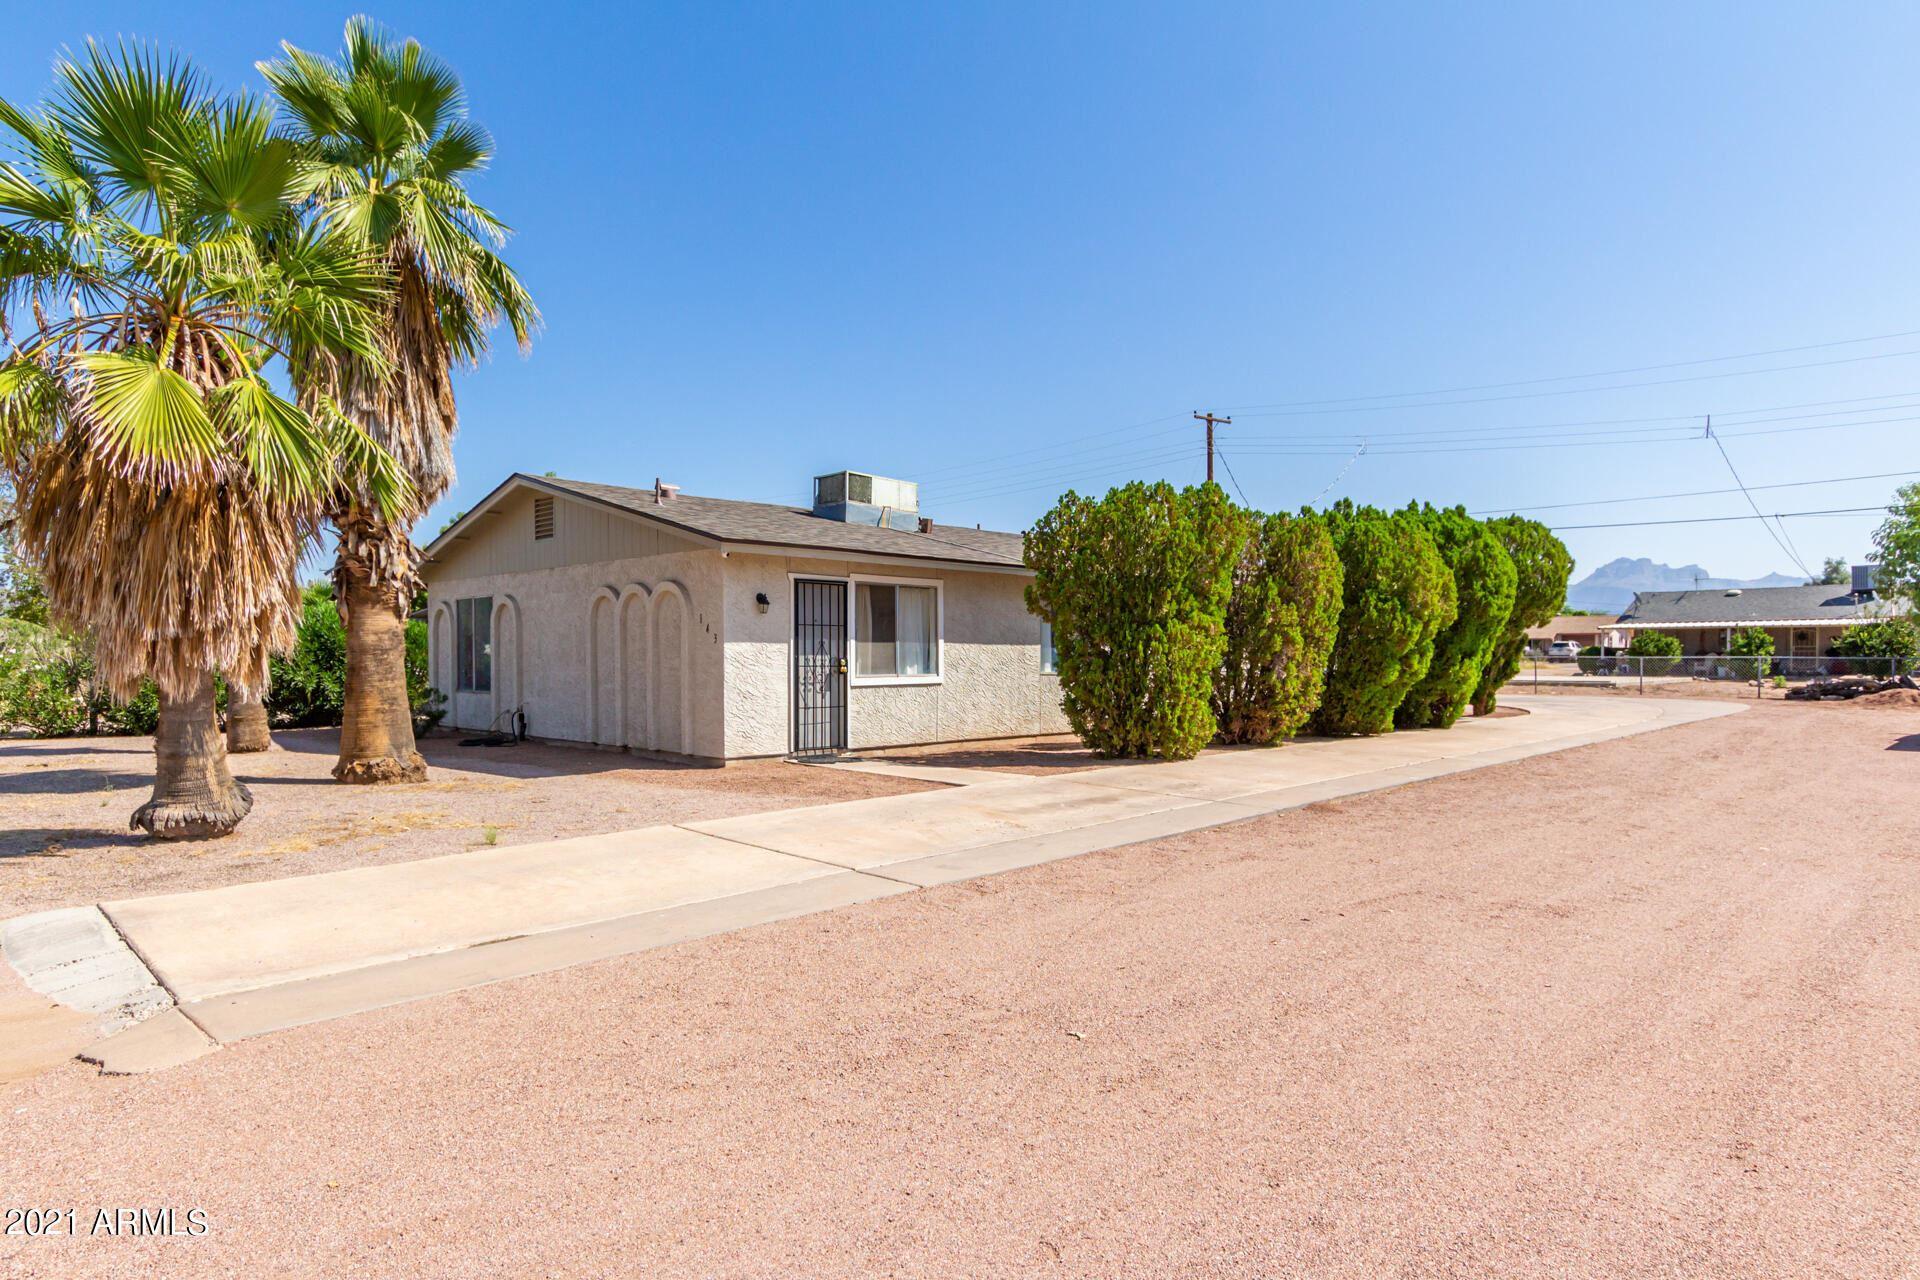 Photo of 143 S Mountain Road, Apache Junction, AZ 85120 (MLS # 6294029)